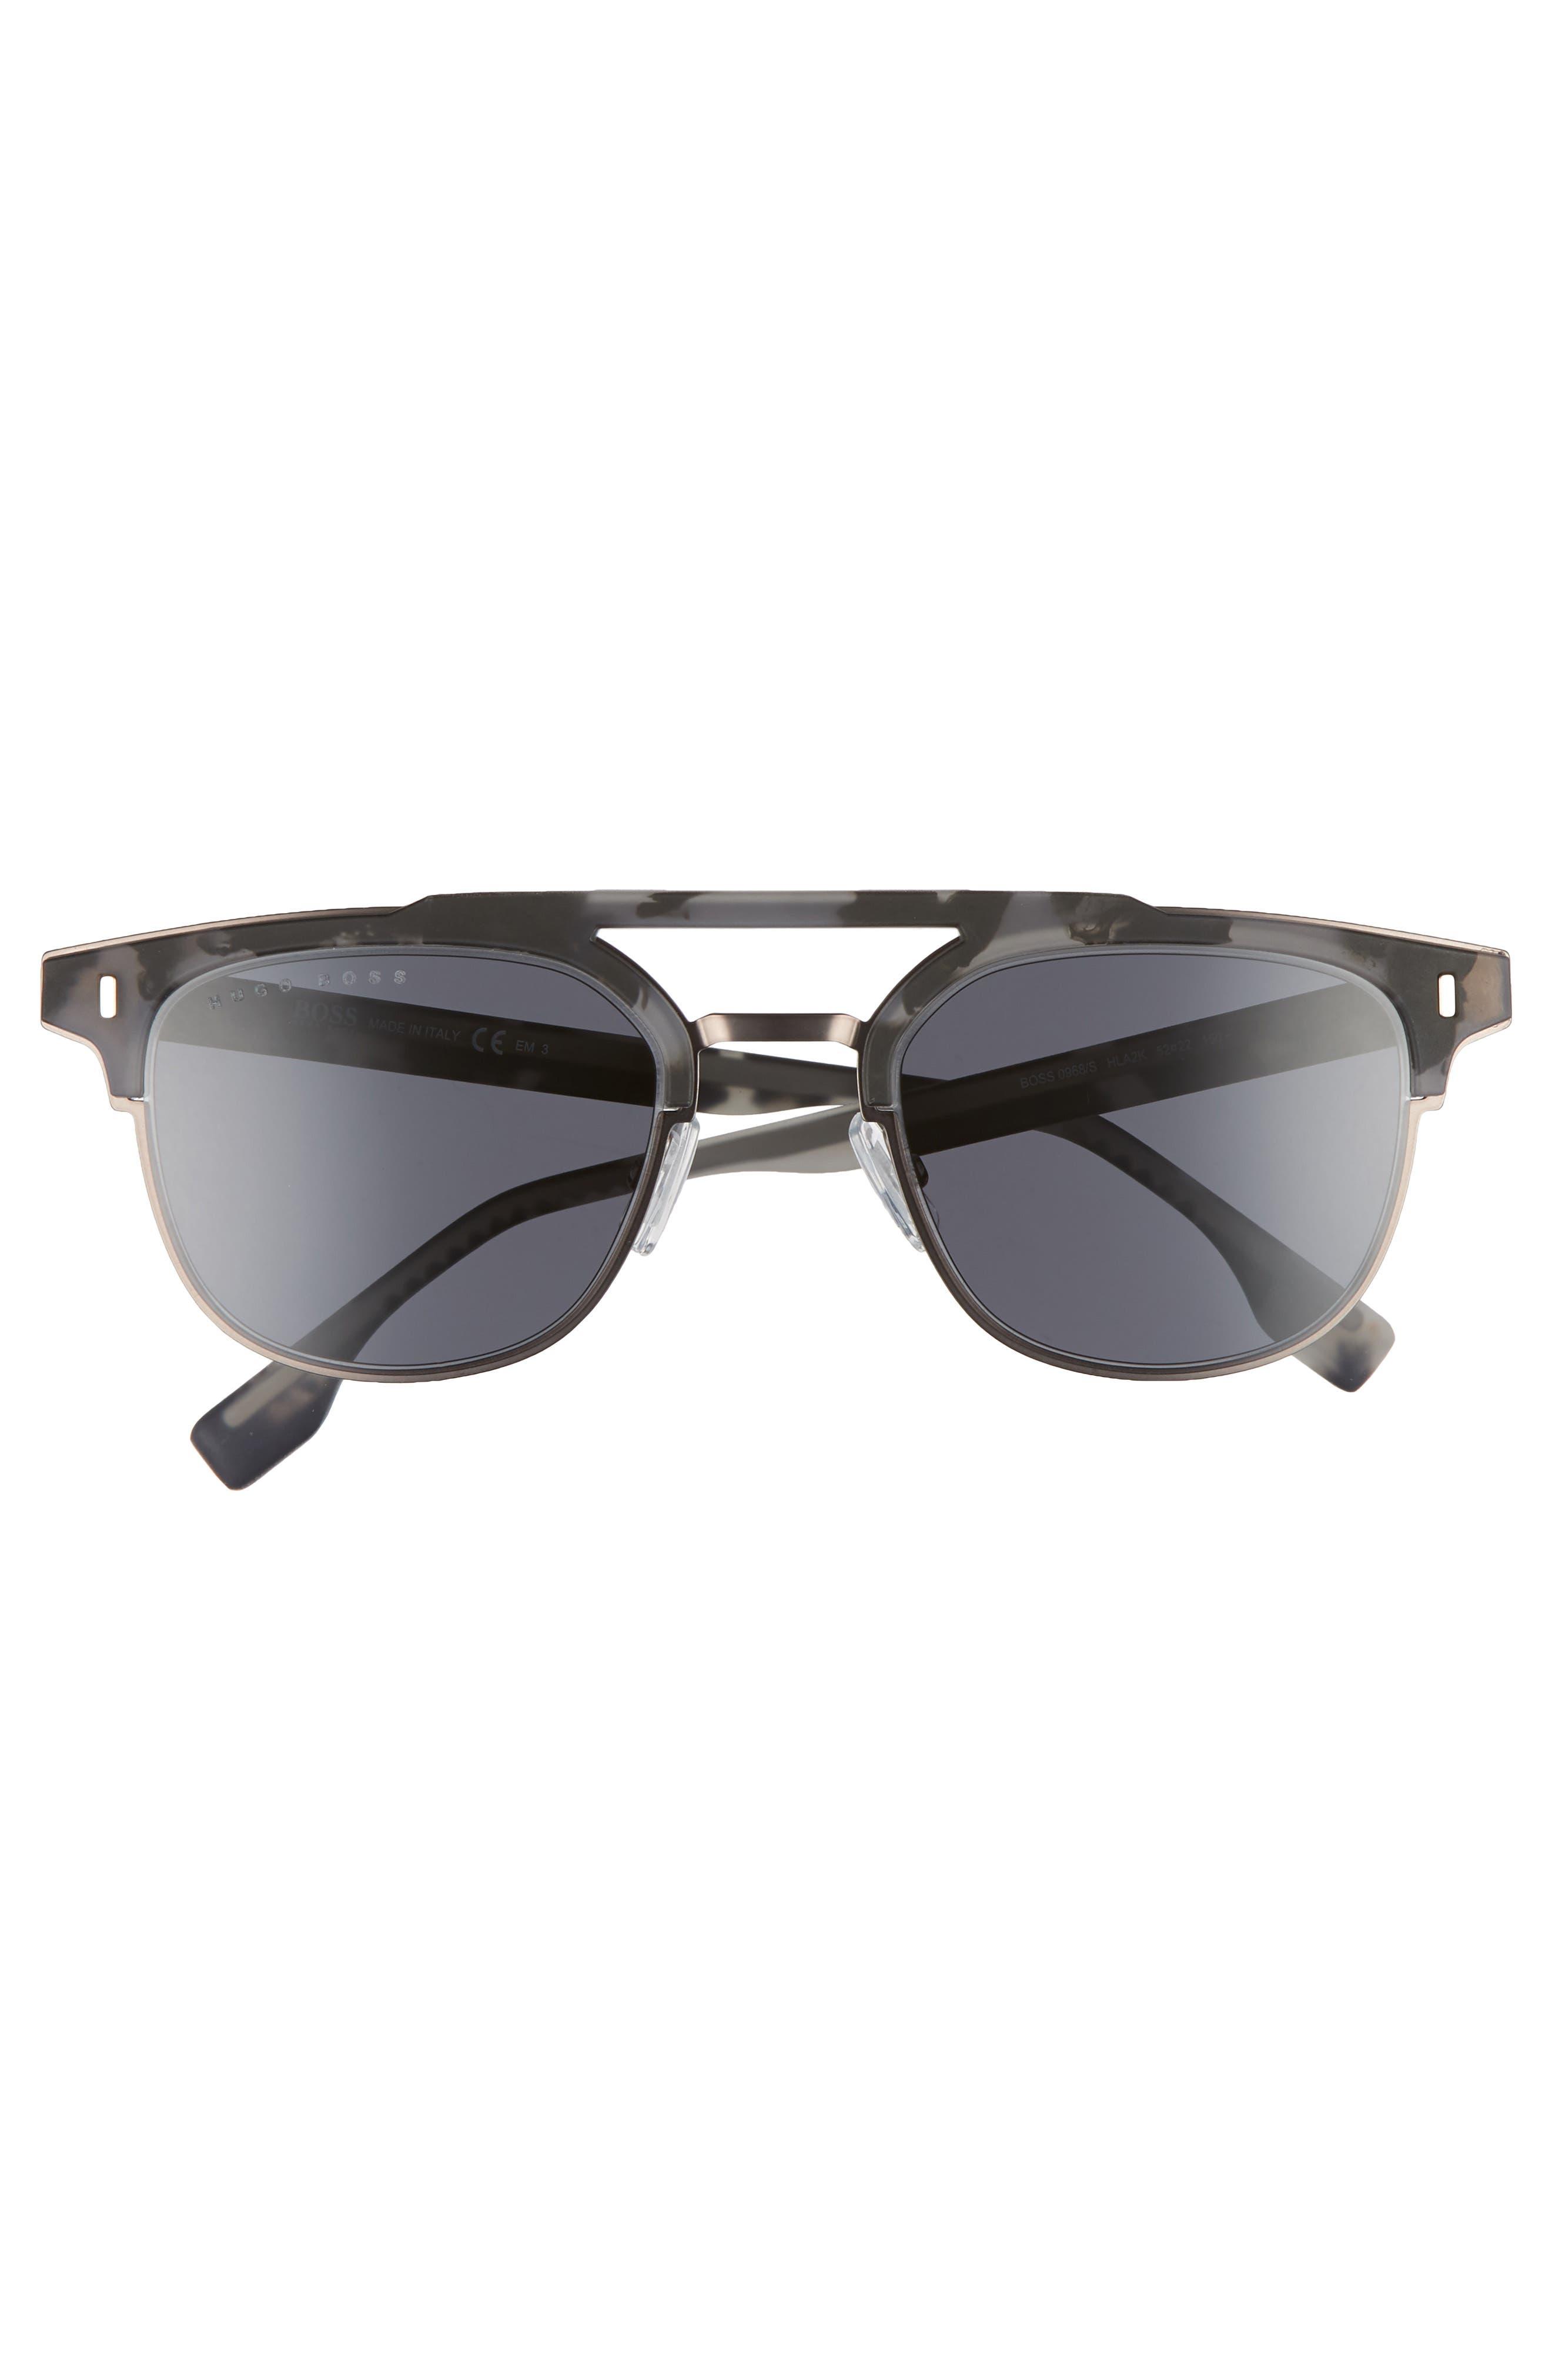 52mm Sunglasses,                             Alternate thumbnail 2, color,                             Mud Havana Rose